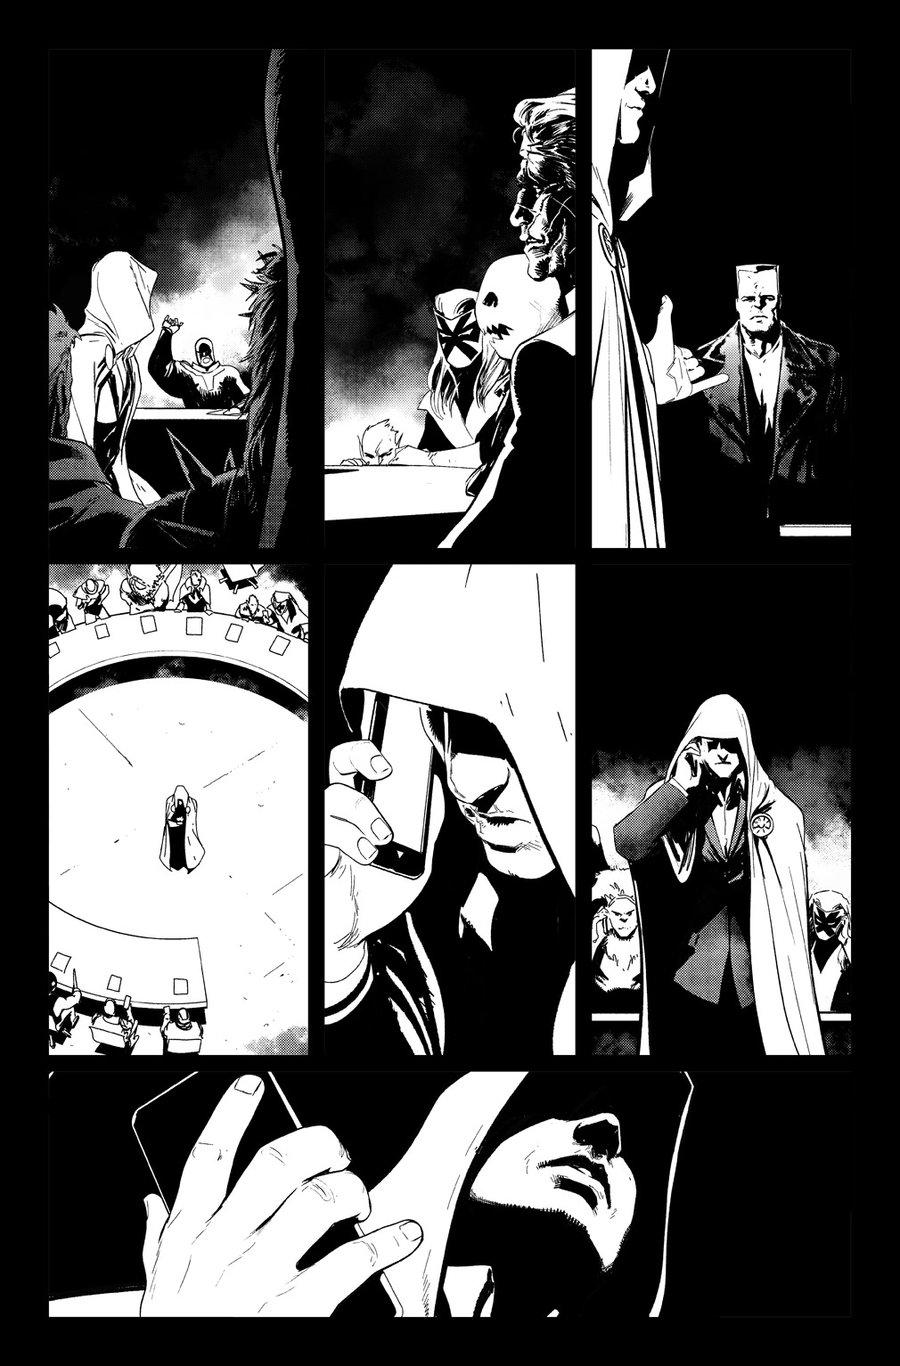 Image of DEFENDERS #10, p.19 ARTIST'S PROOF